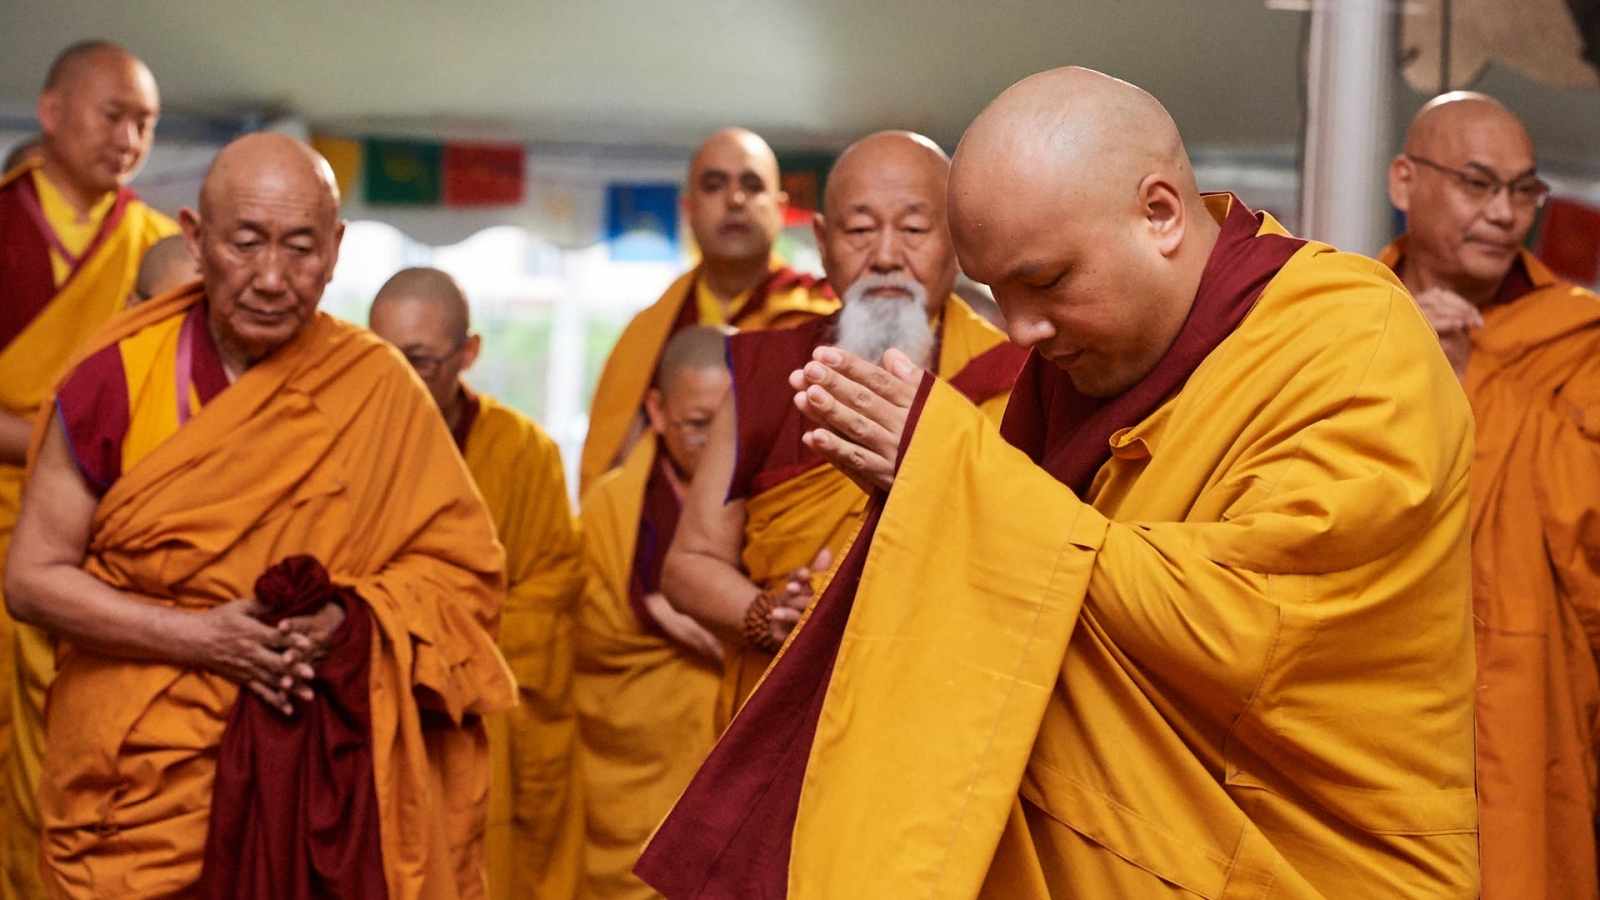 karmapa bowing